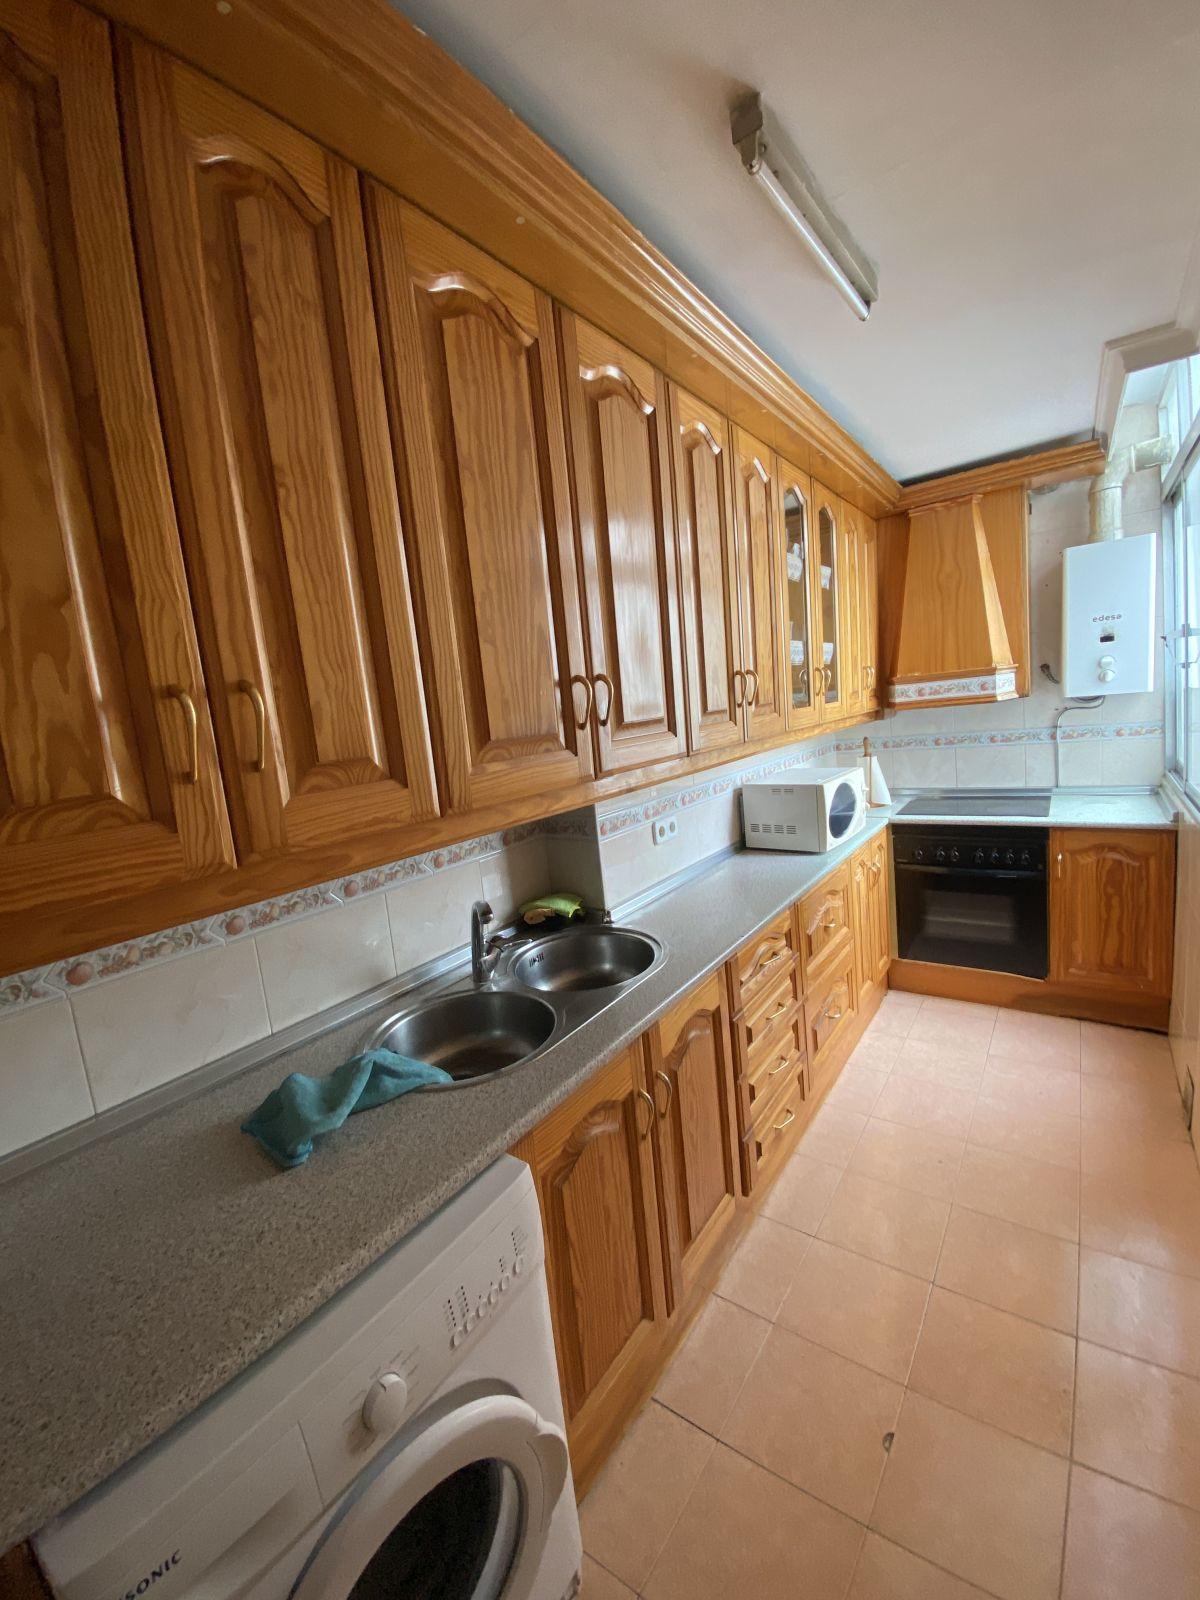 Апартамент - Fuengirola - R3596807 - mibgroup.es